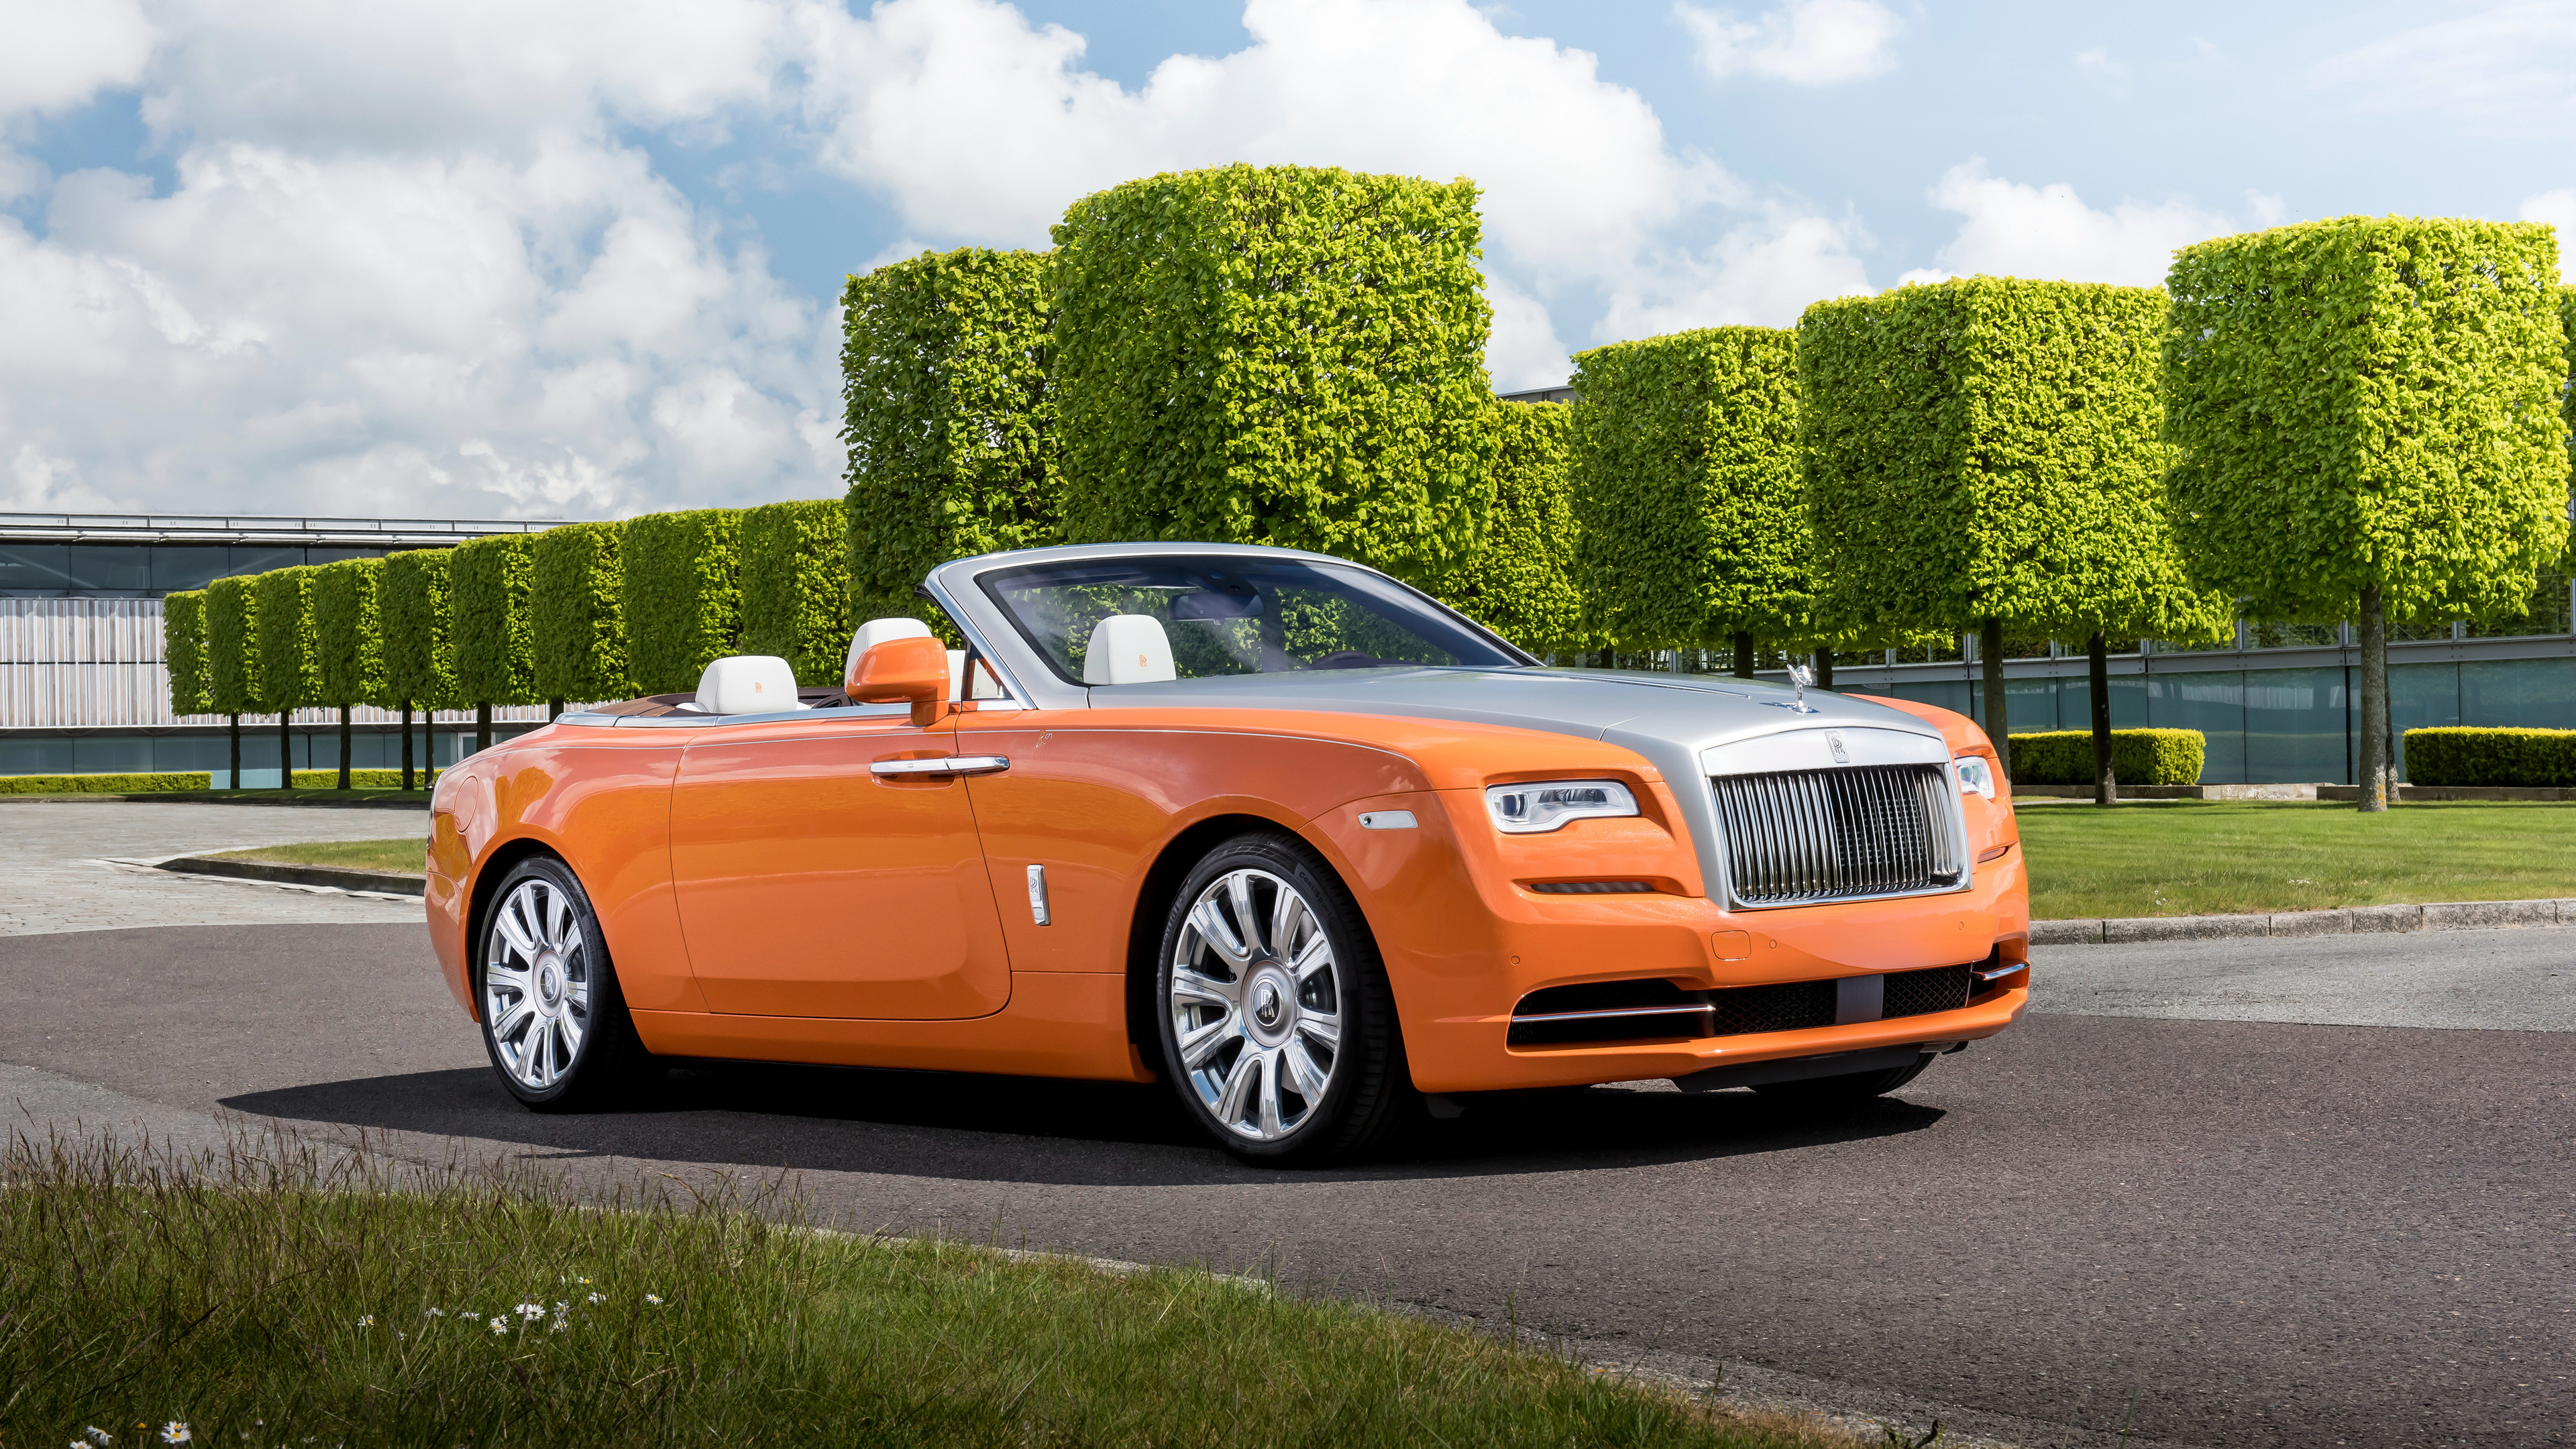 rolls royce dawn b50 1539109136 - Rolls Royce Dawn B50 - rolls royce wallpapers, rolls royce dawn wallpapers, hd-wallpapers, cars wallpapers, 4k-wallpapers, 2018 cars wallpapers